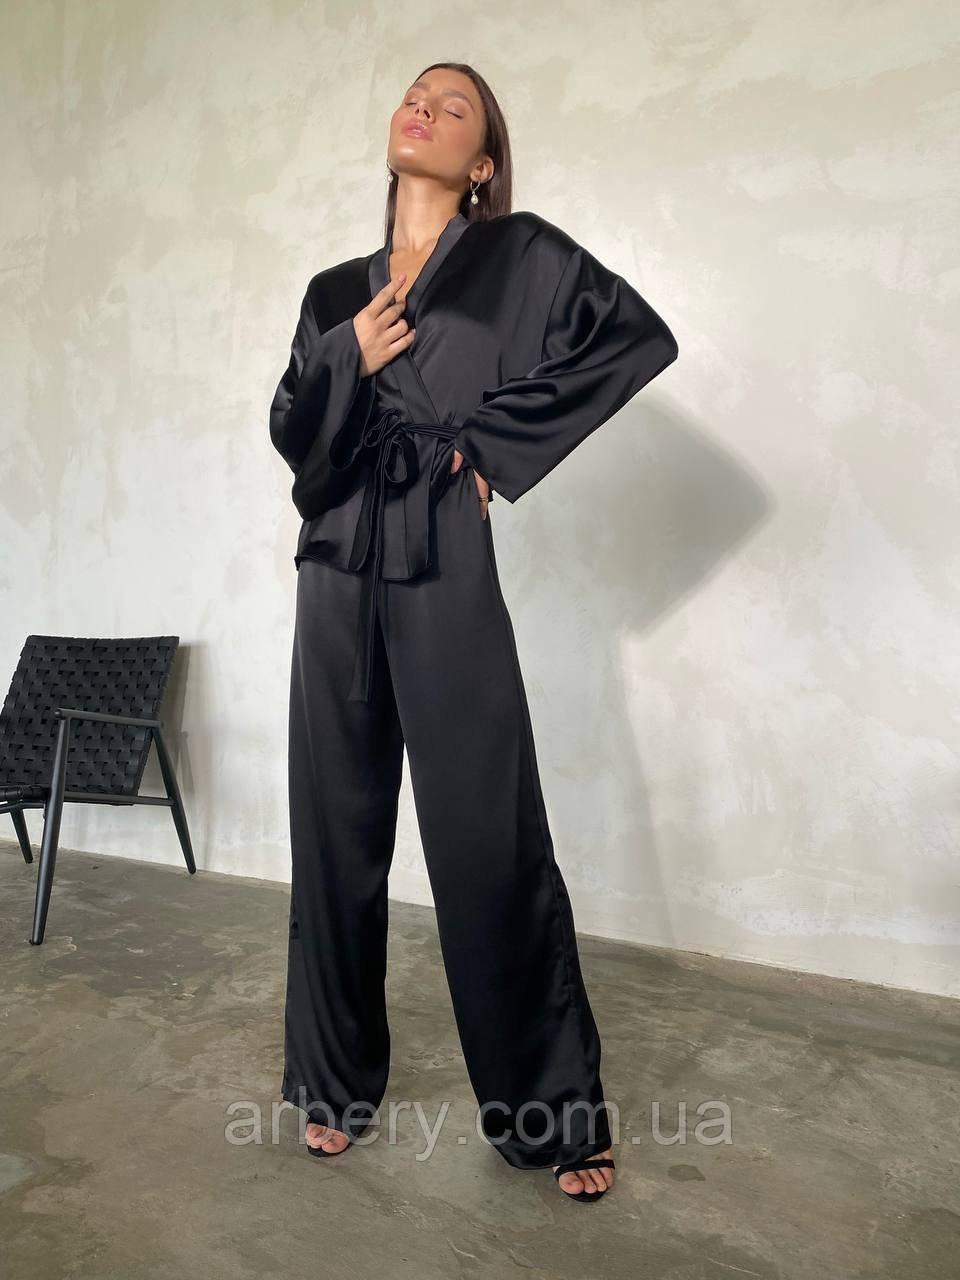 Шикарний сатиновий костюм-кимано